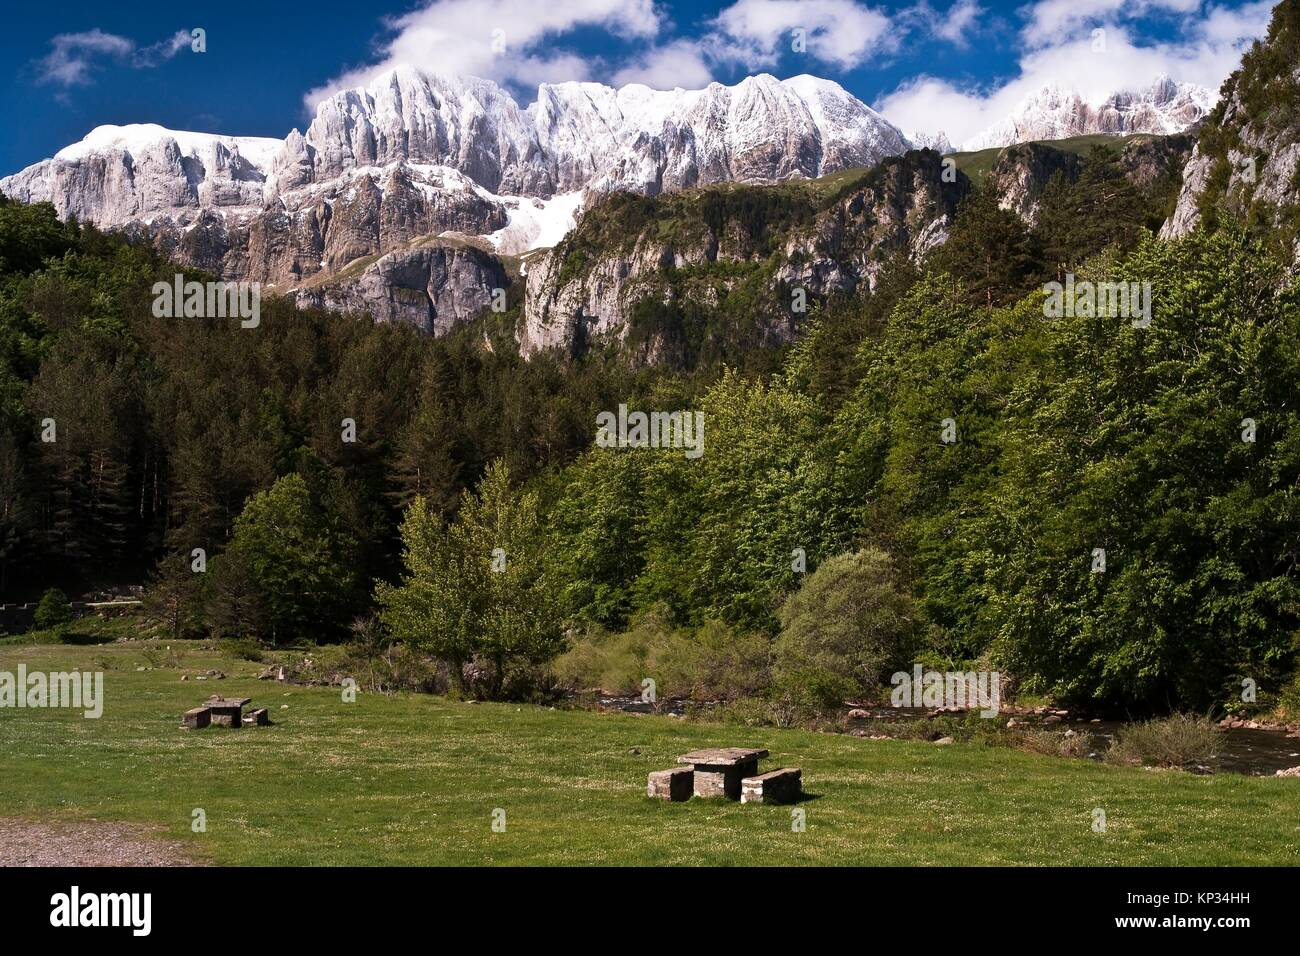 Selva De Oza Valle De Hecho Aragonese Pyrenees Huesca Province Stock Photo Alamy